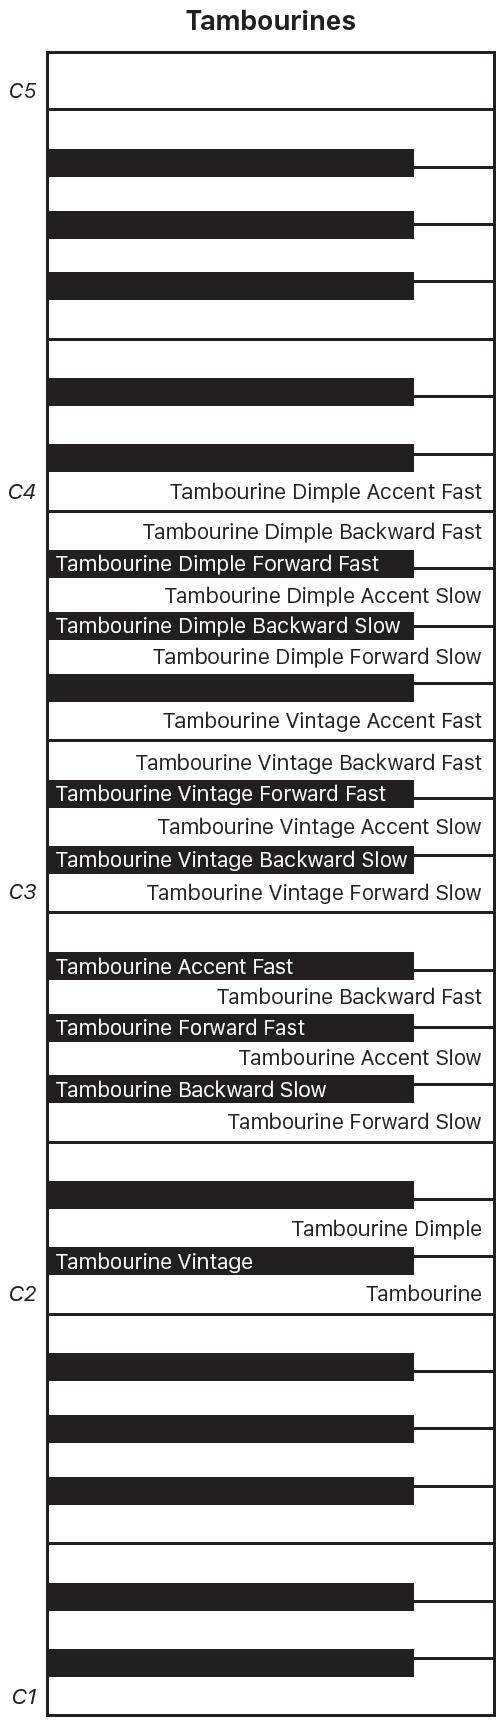 Figure. Tambourines performance keyboard map.